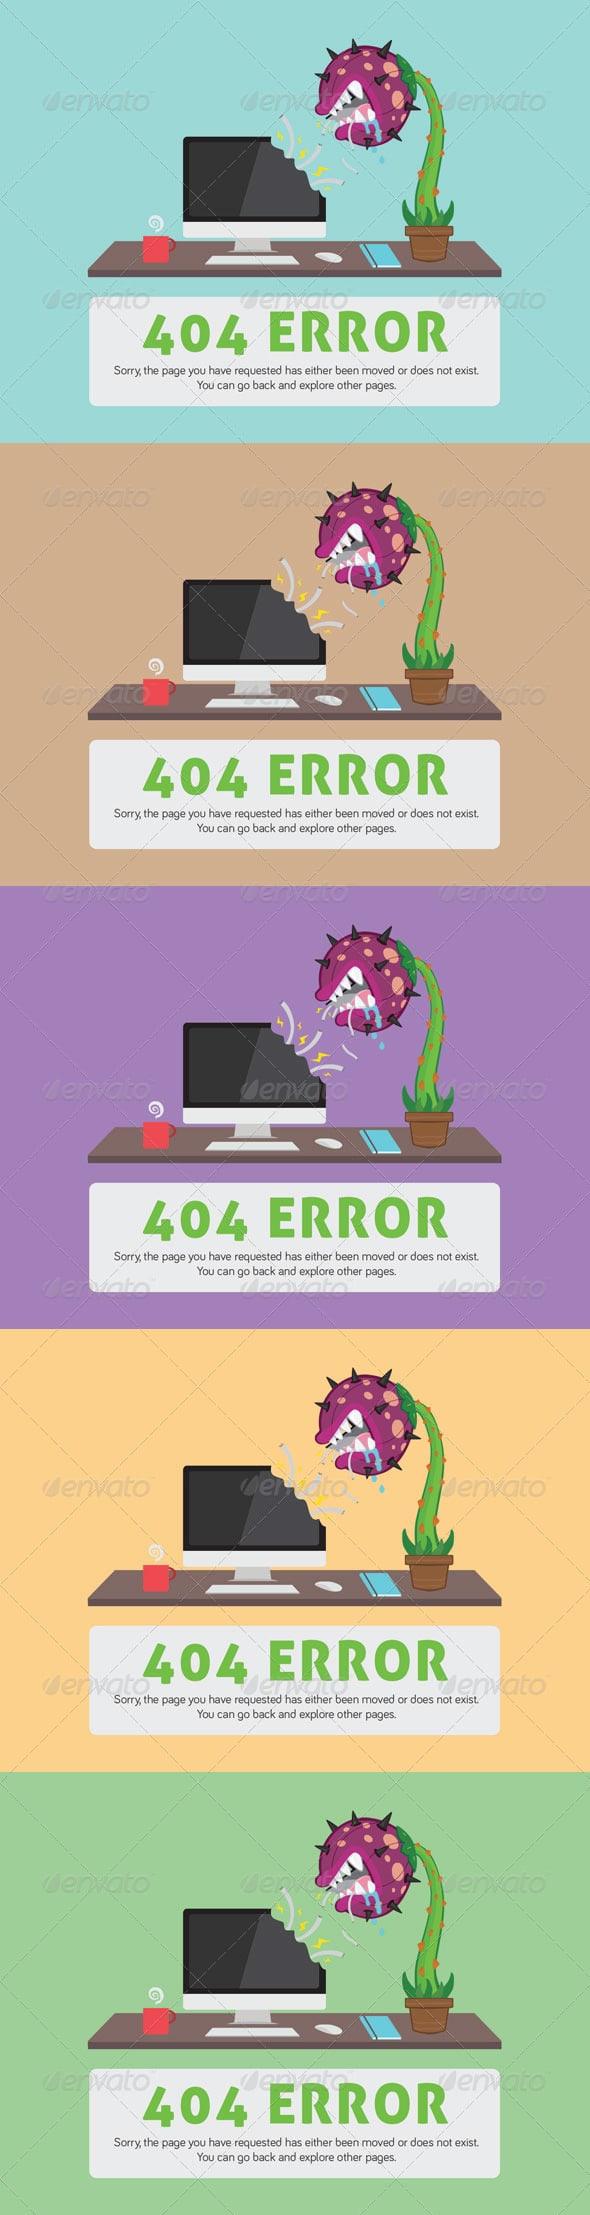 Carnivorous Plant 404 ERROR Web Page